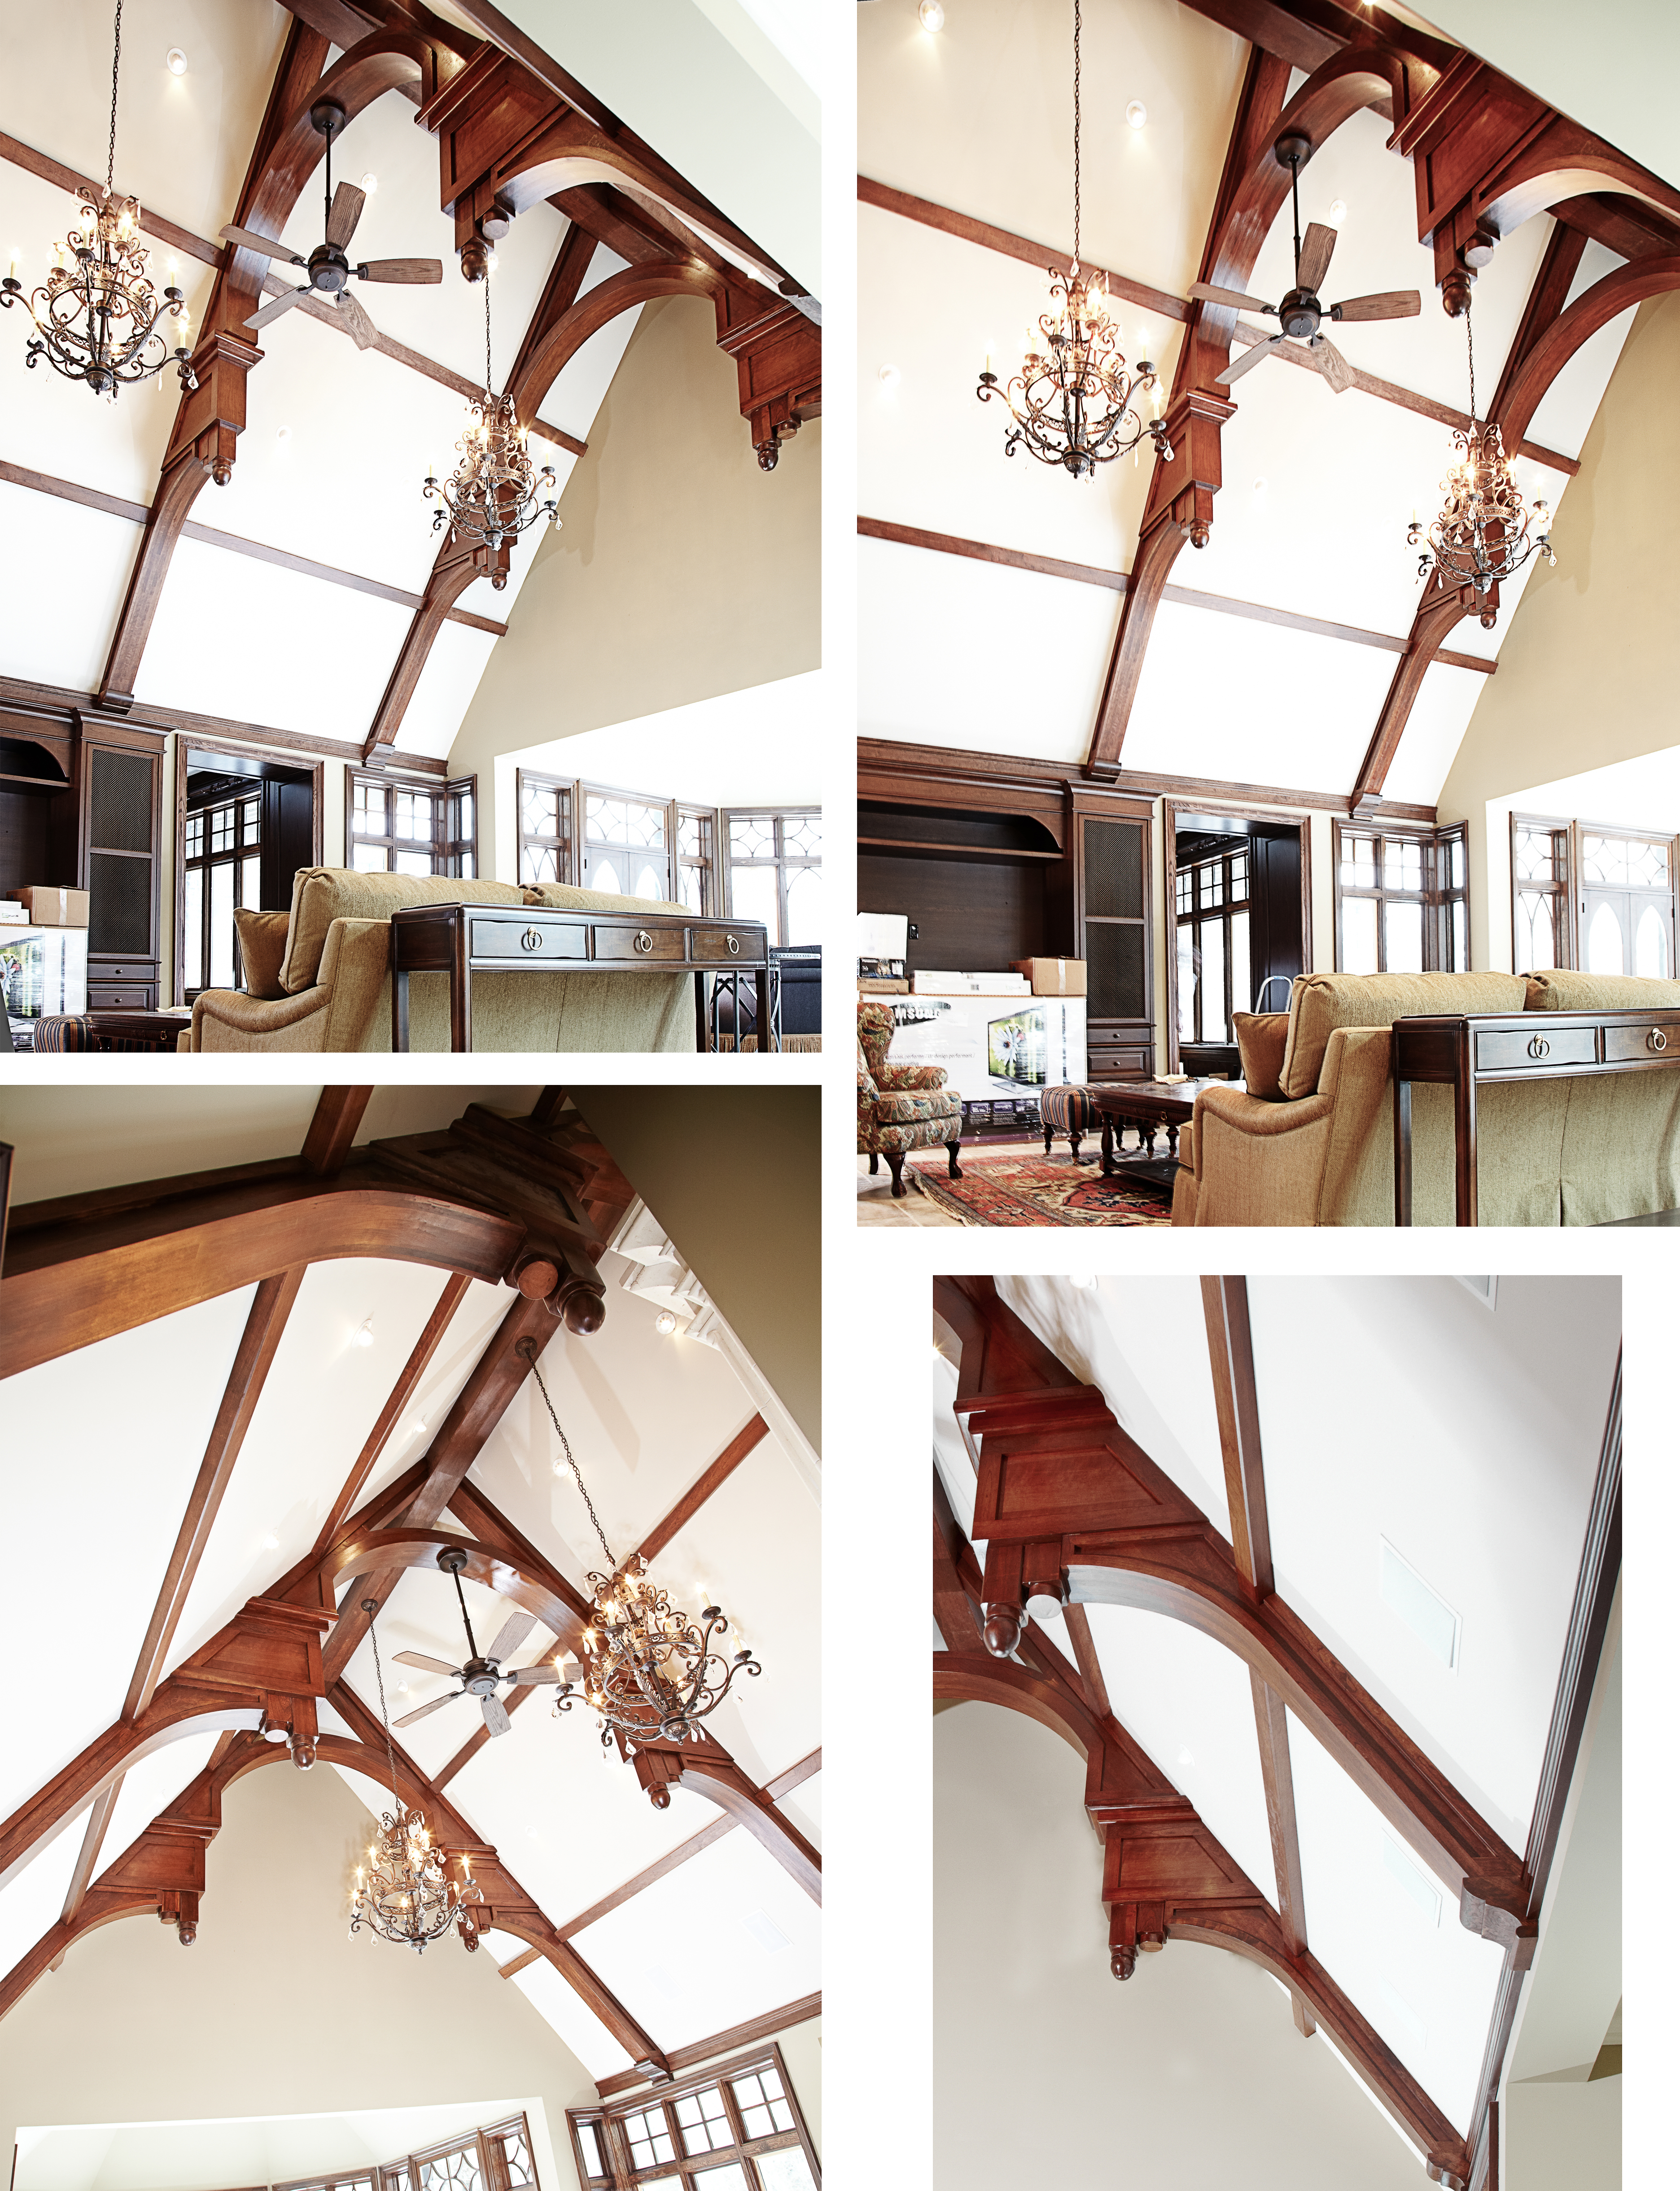 Cherry ceiling beams